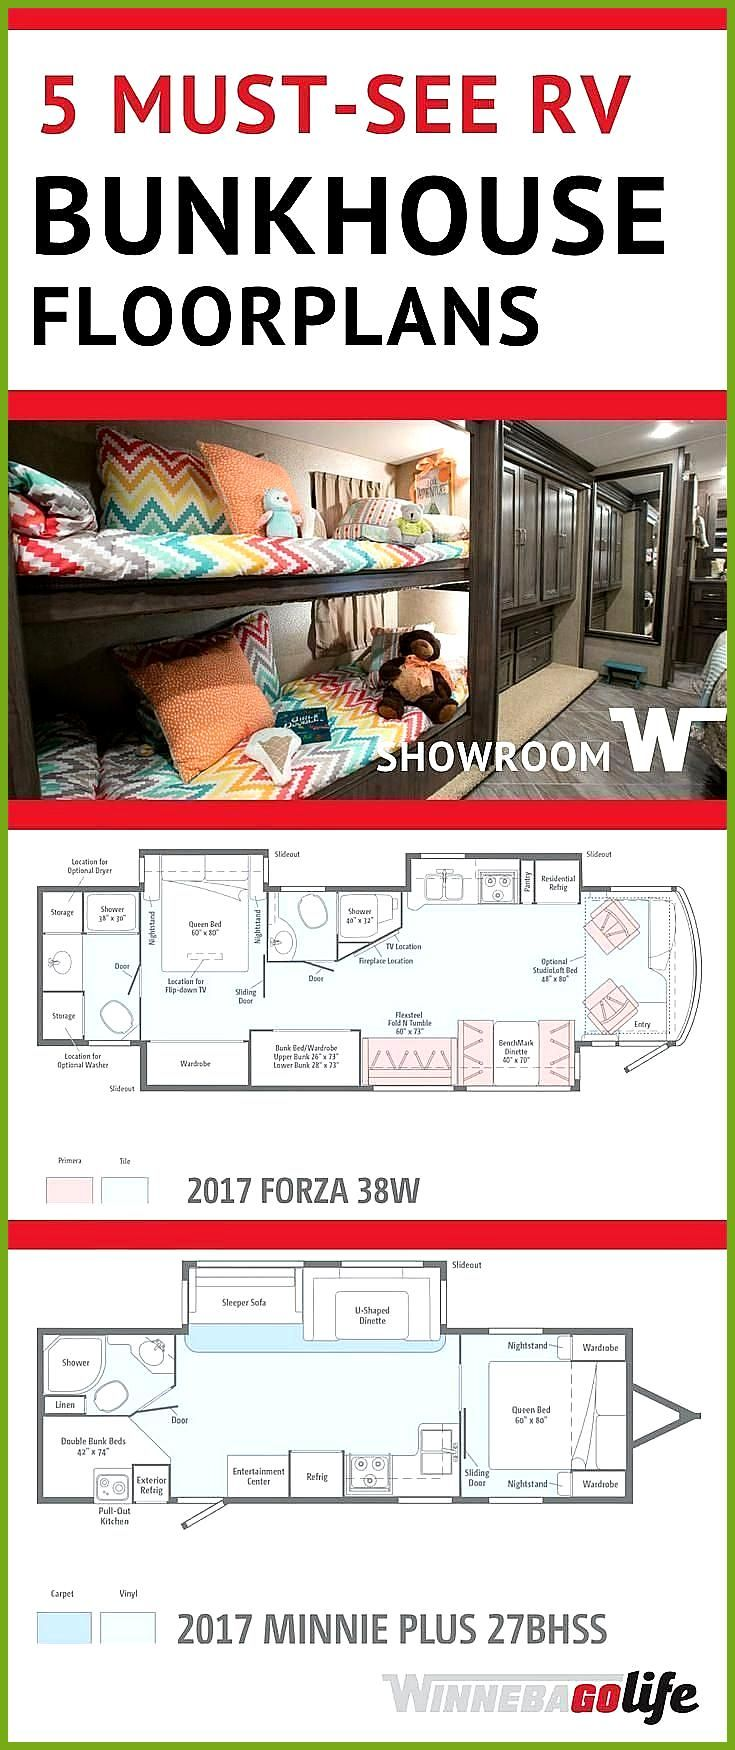 5 Must See Rv Bunkhouse Floorplans 5 Must See Rv Bunkhouse Floorplans Are You Thinking About Embracing Th Travel Trailer Floor Plans Bunk House Rv Floor Plans